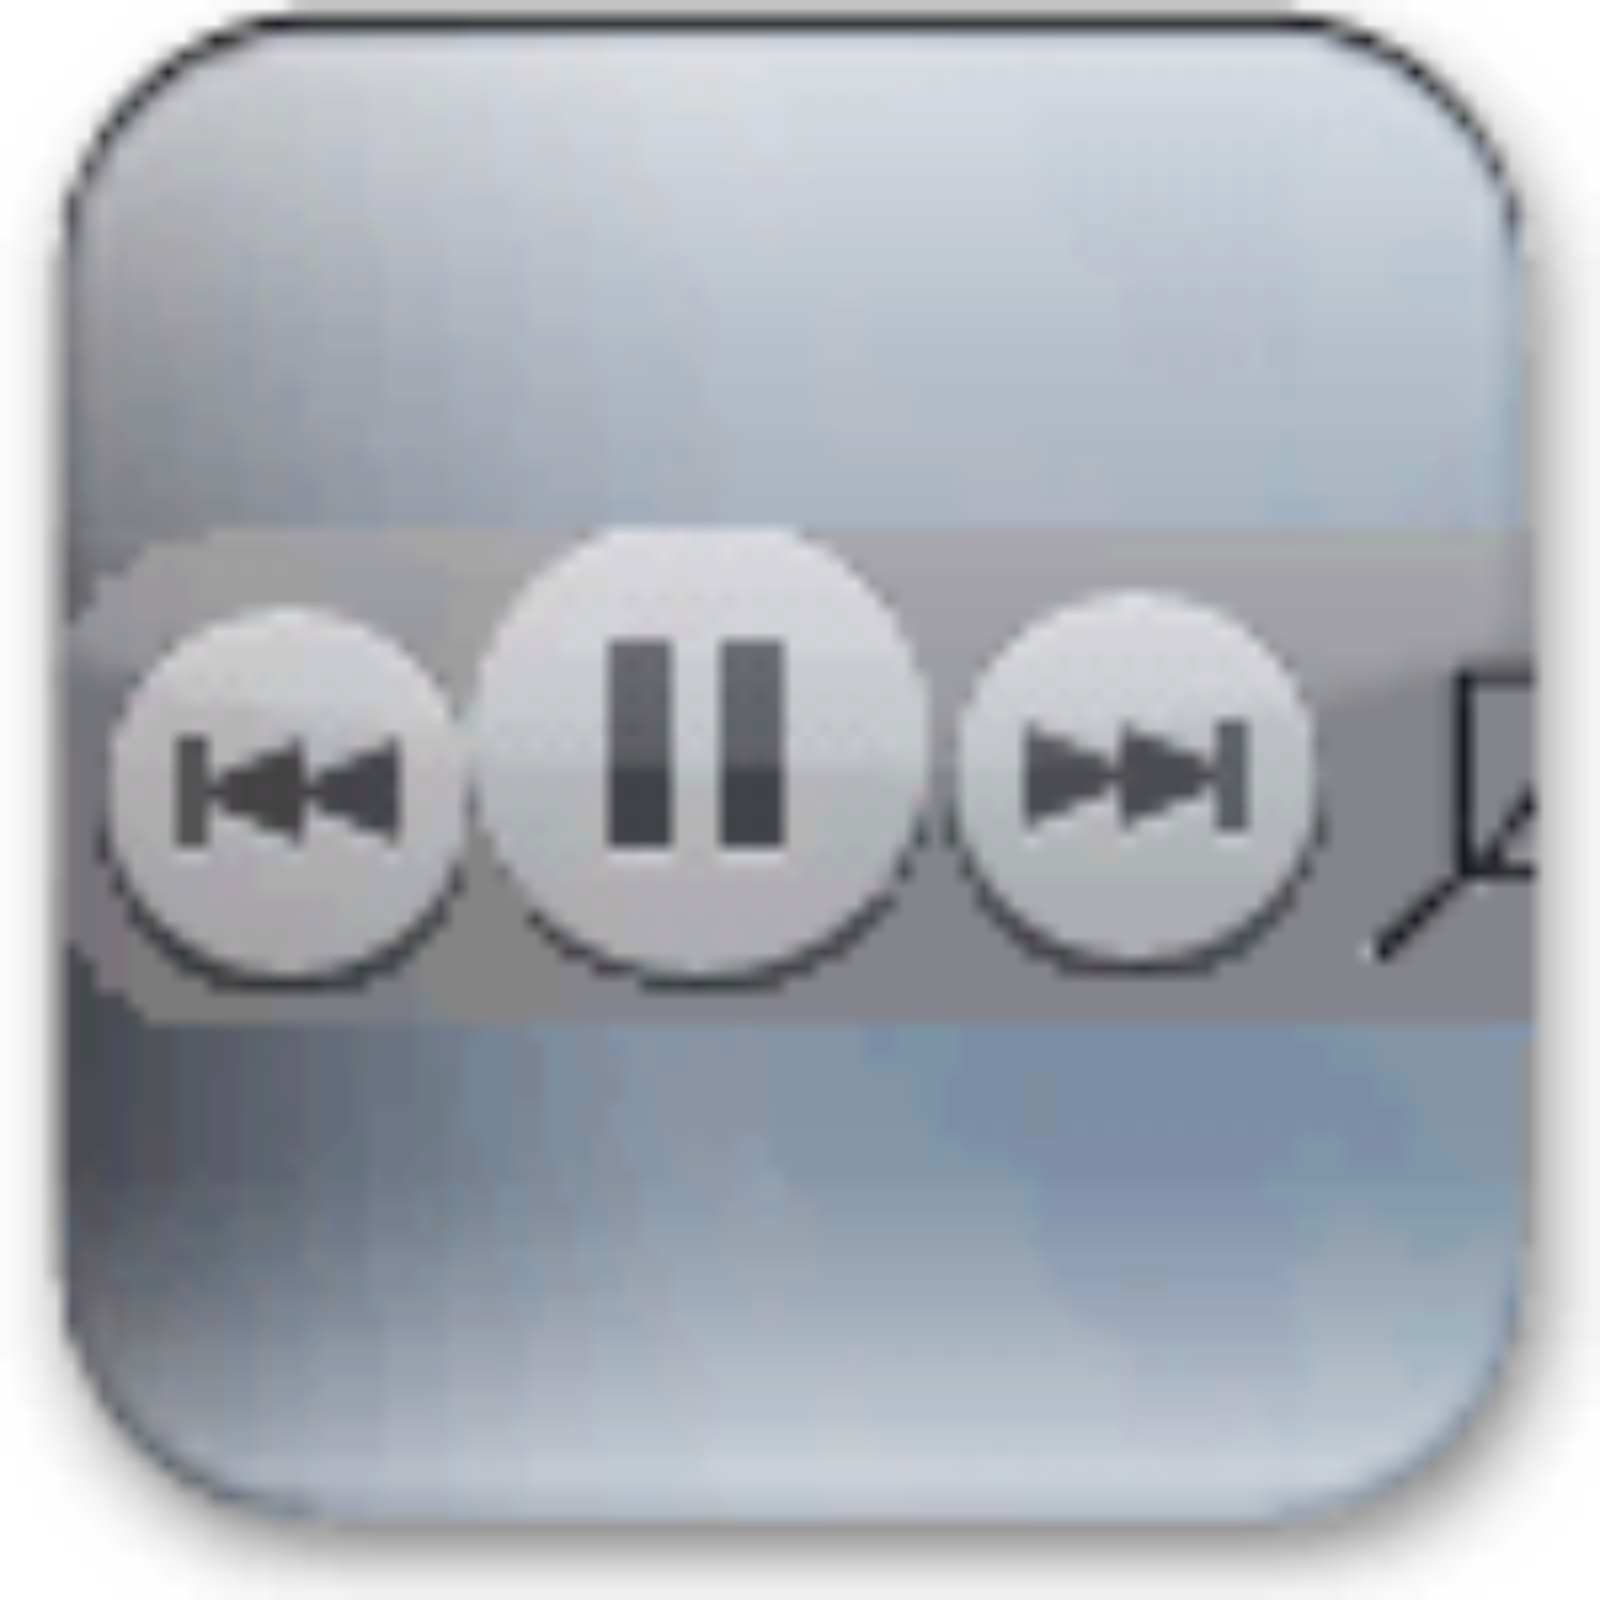 Spotifycontrol